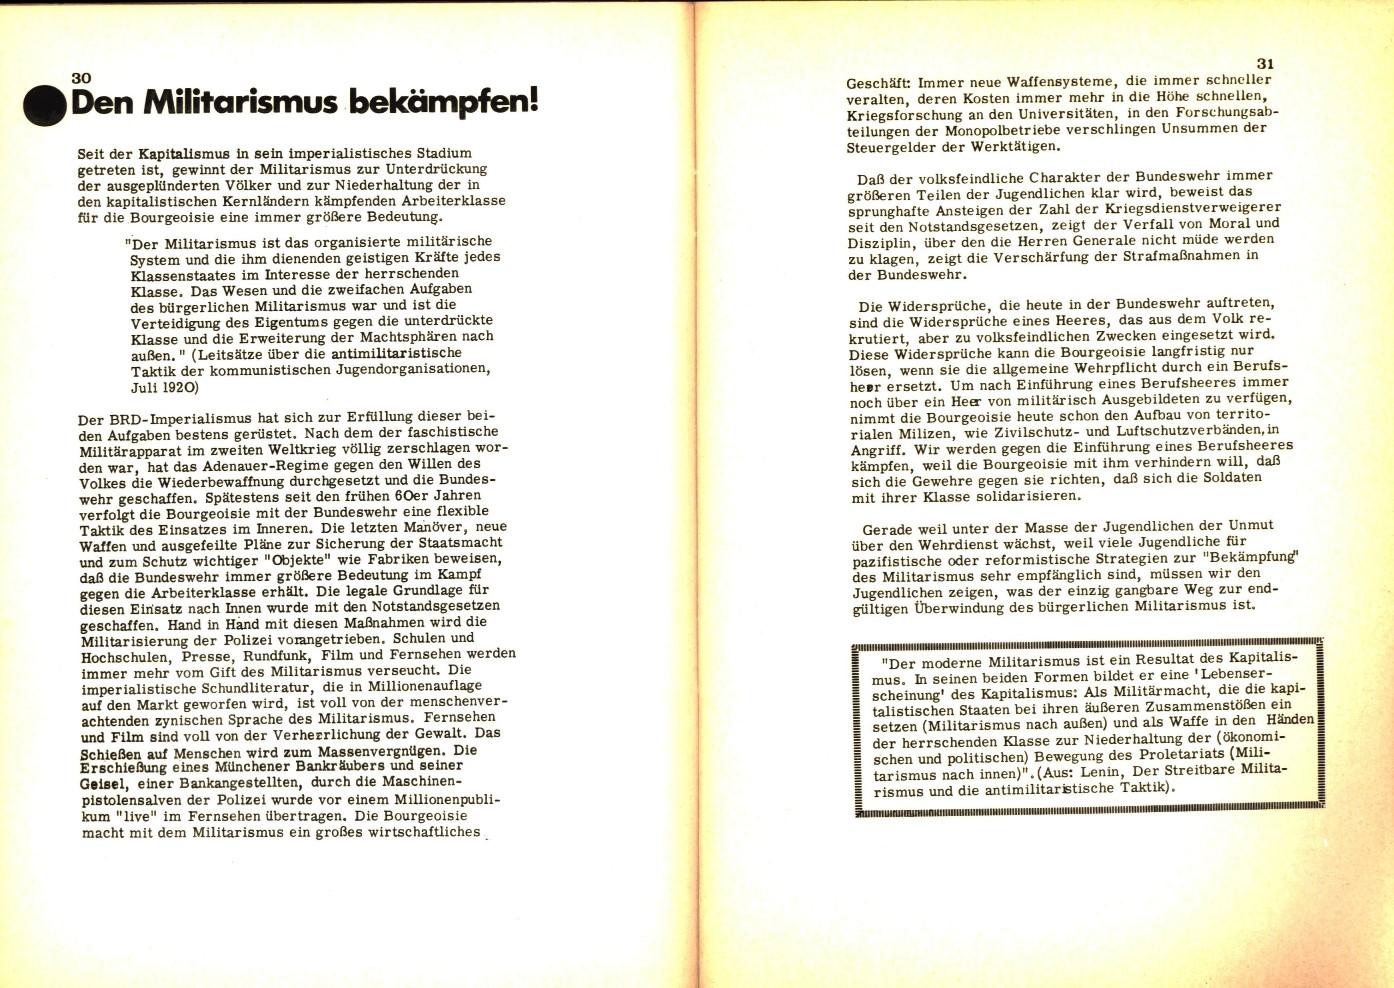 KOV_1973_Aktionsprogramm_18